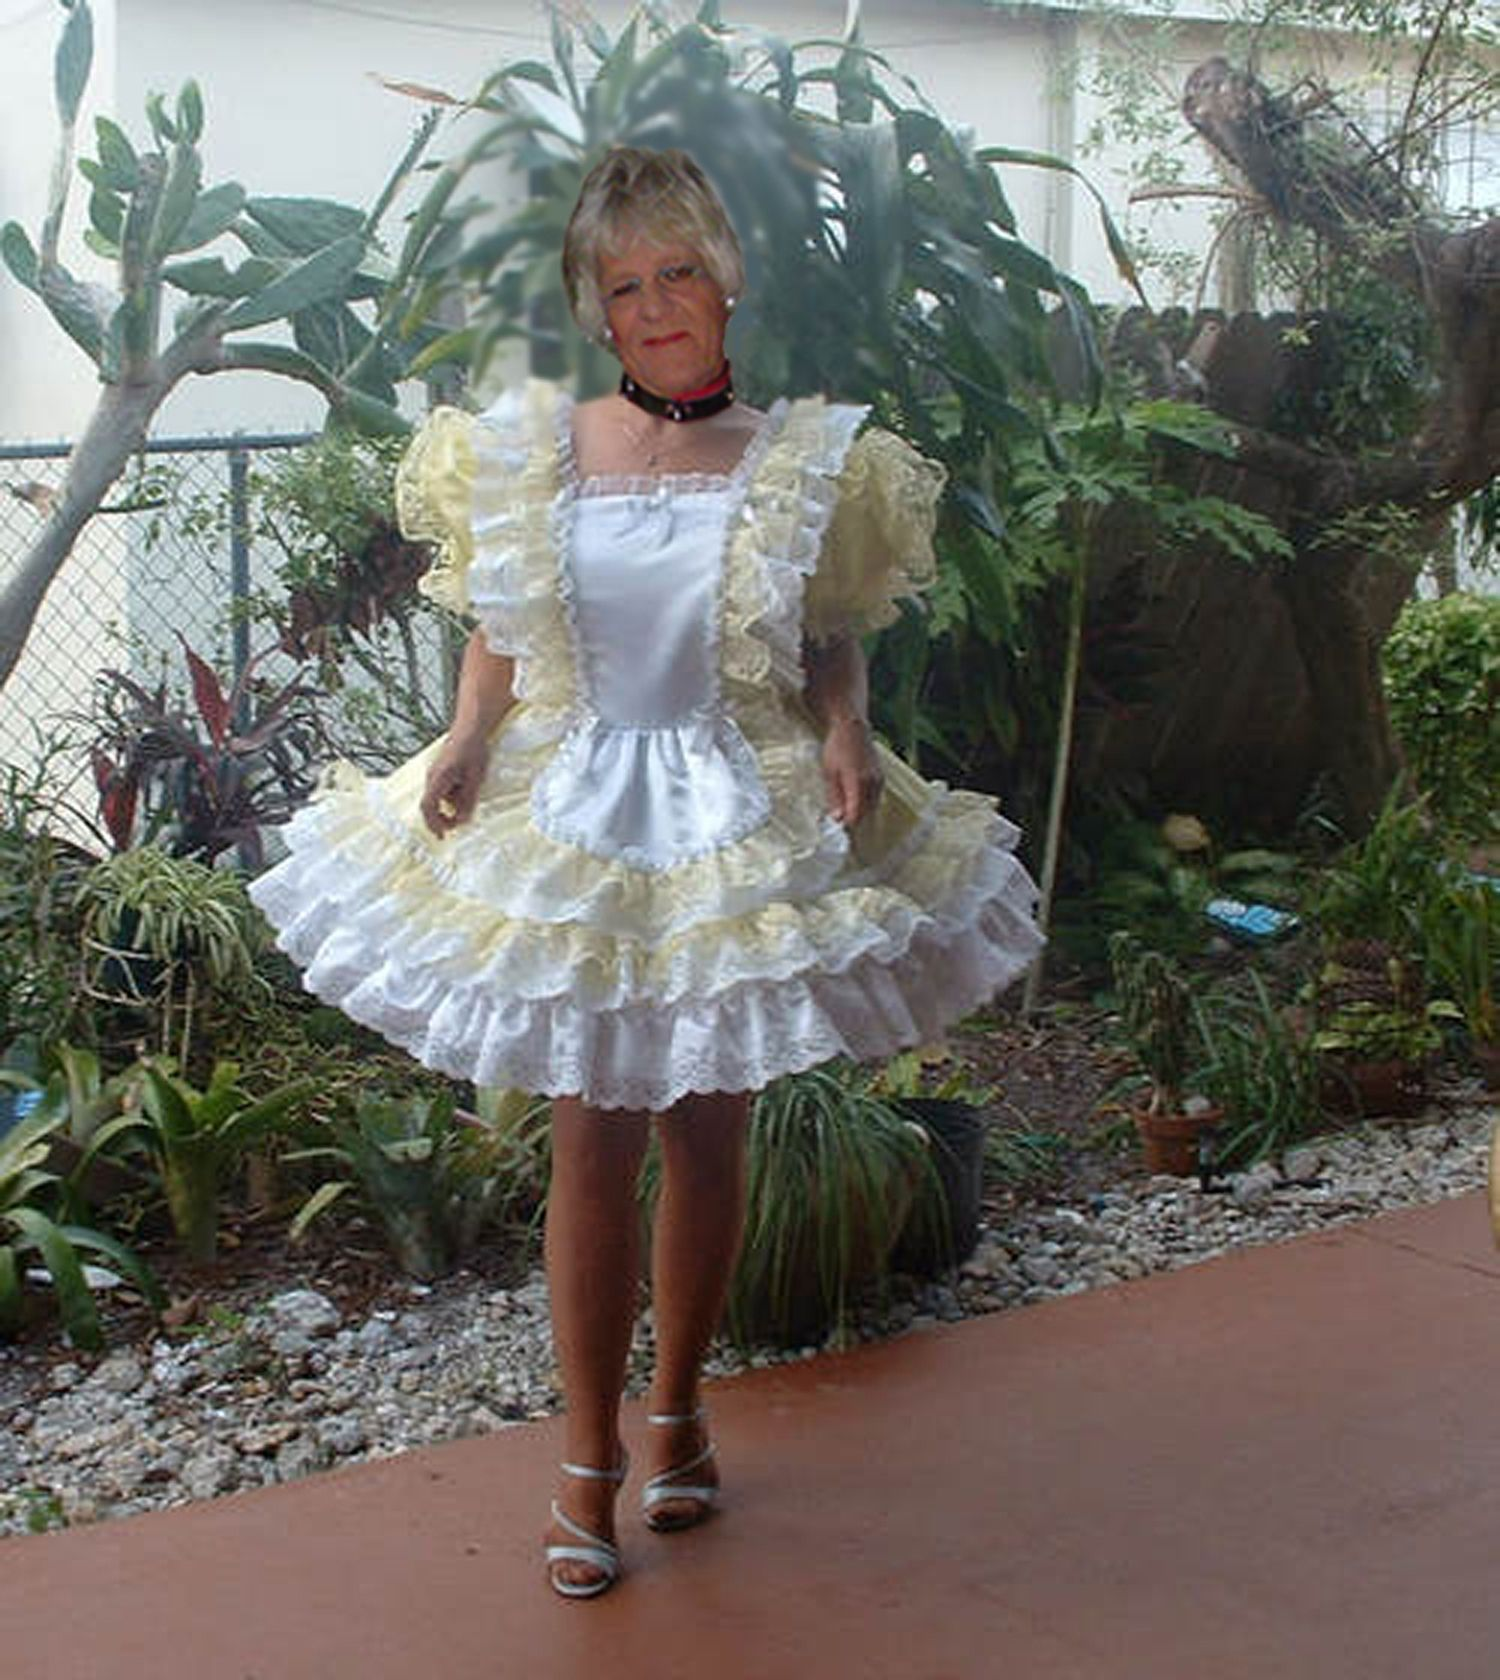 Sissy Adult Baby Dress 1 Sewing Maid Dress Dresses En Sissy Maid